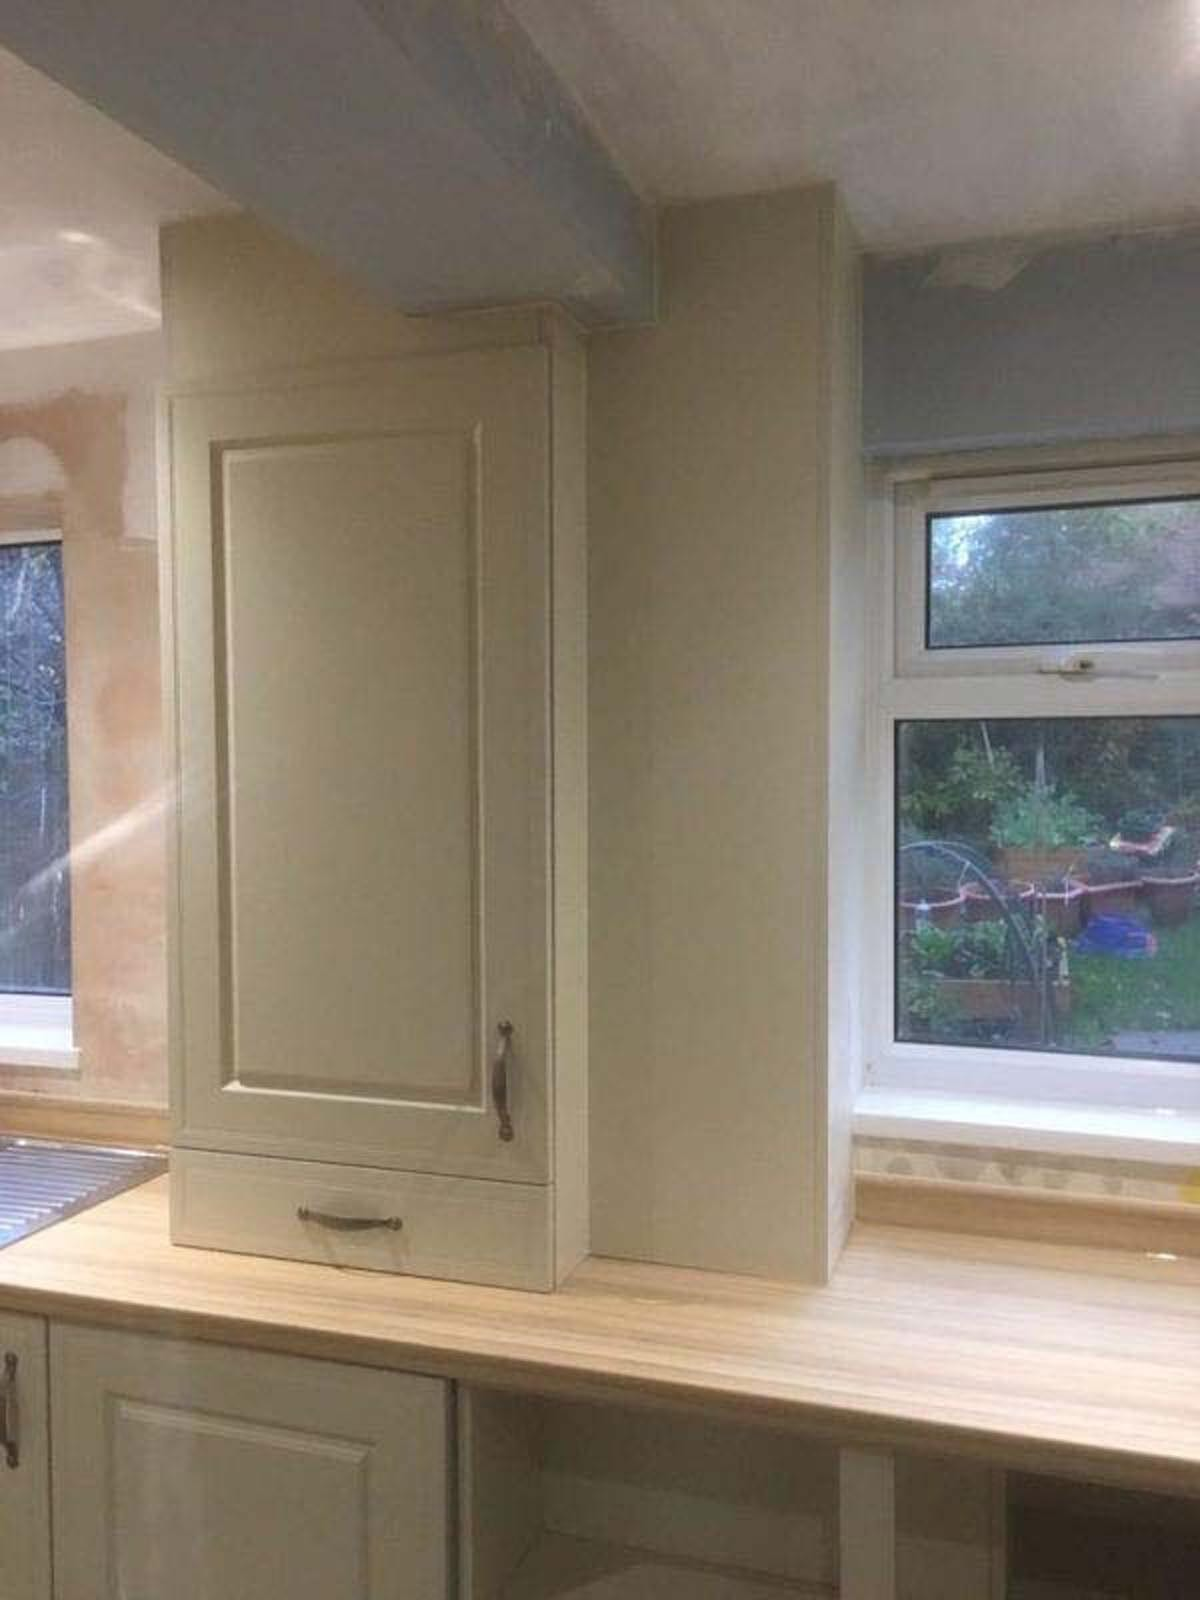 Mr and Mrs Grettons' Kitchen Installation, Ilkeston